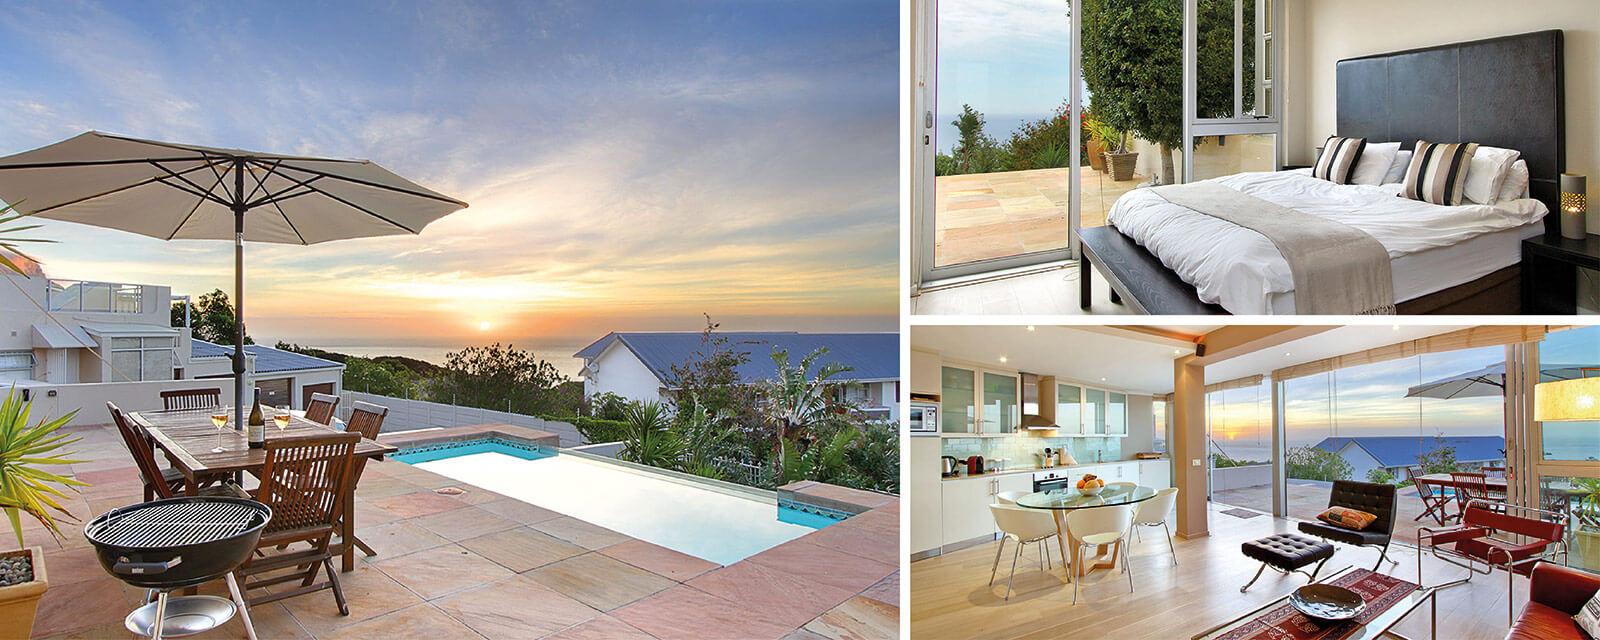 CALICO | Kapstadt, Camps Bay | Luxus Apartment bei LANDMARK mieten